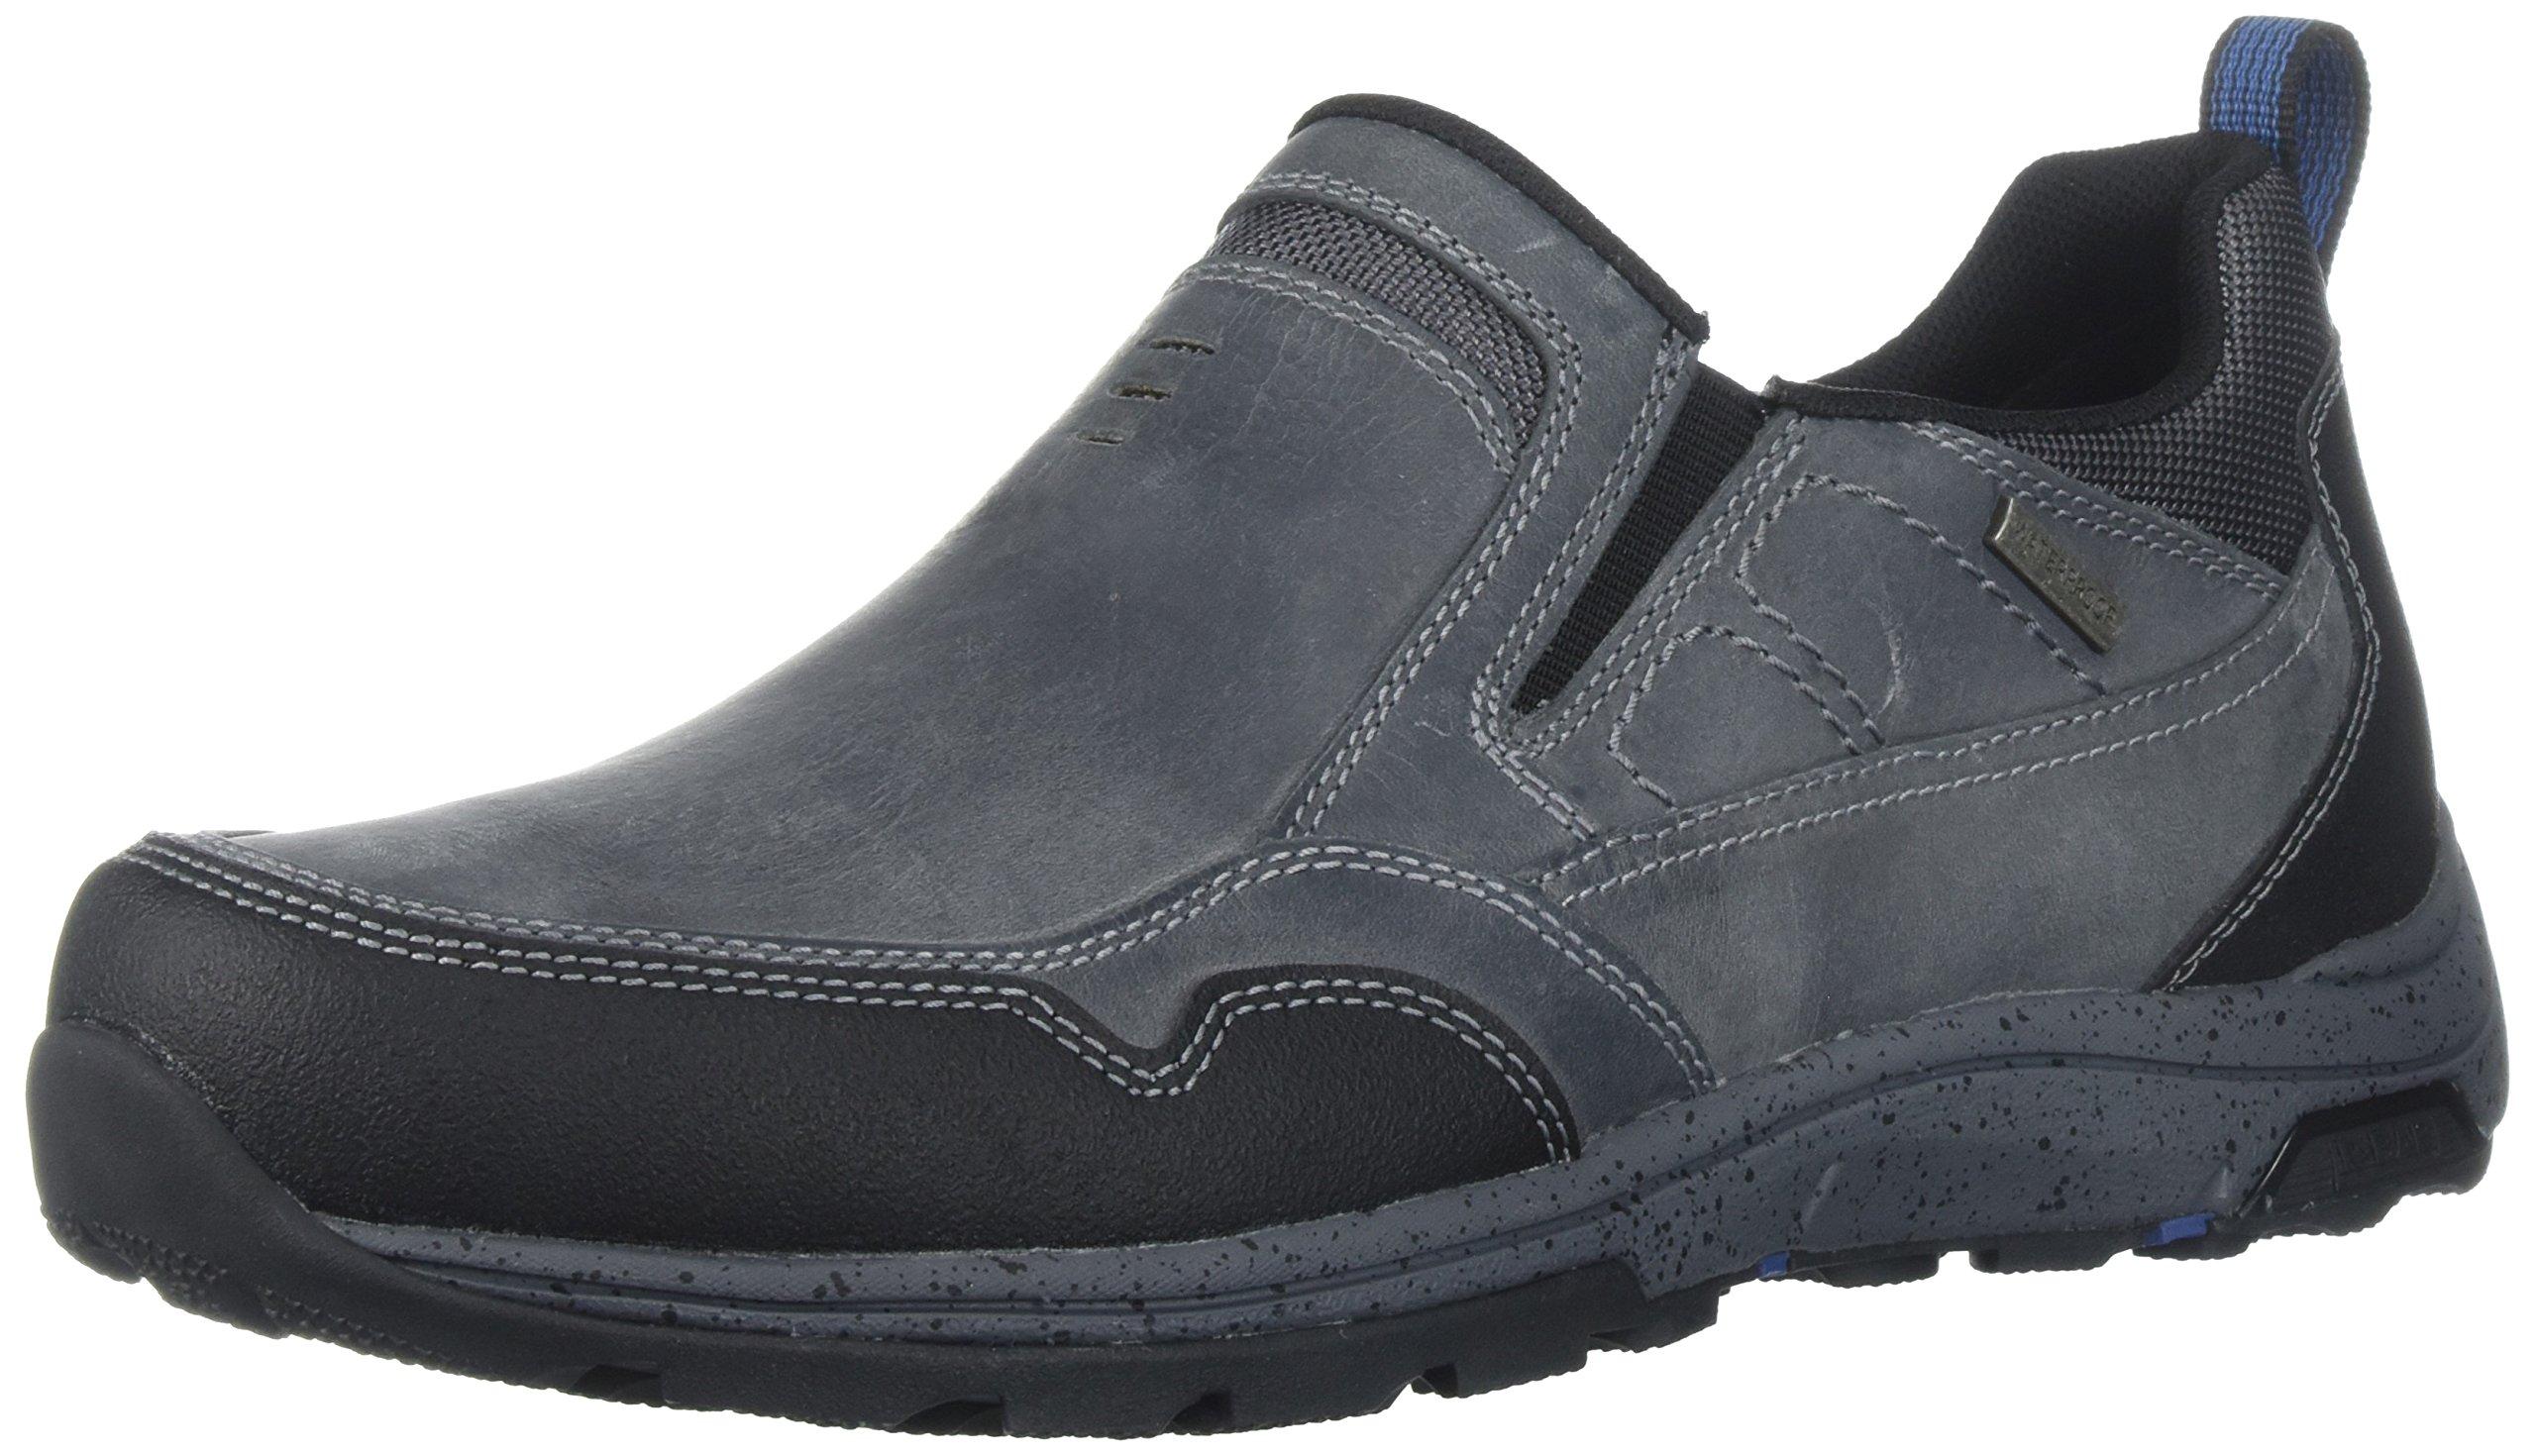 Dunham Men's Trukka Slip on Rain Shoe, Grey, 11 2E US by Dunham